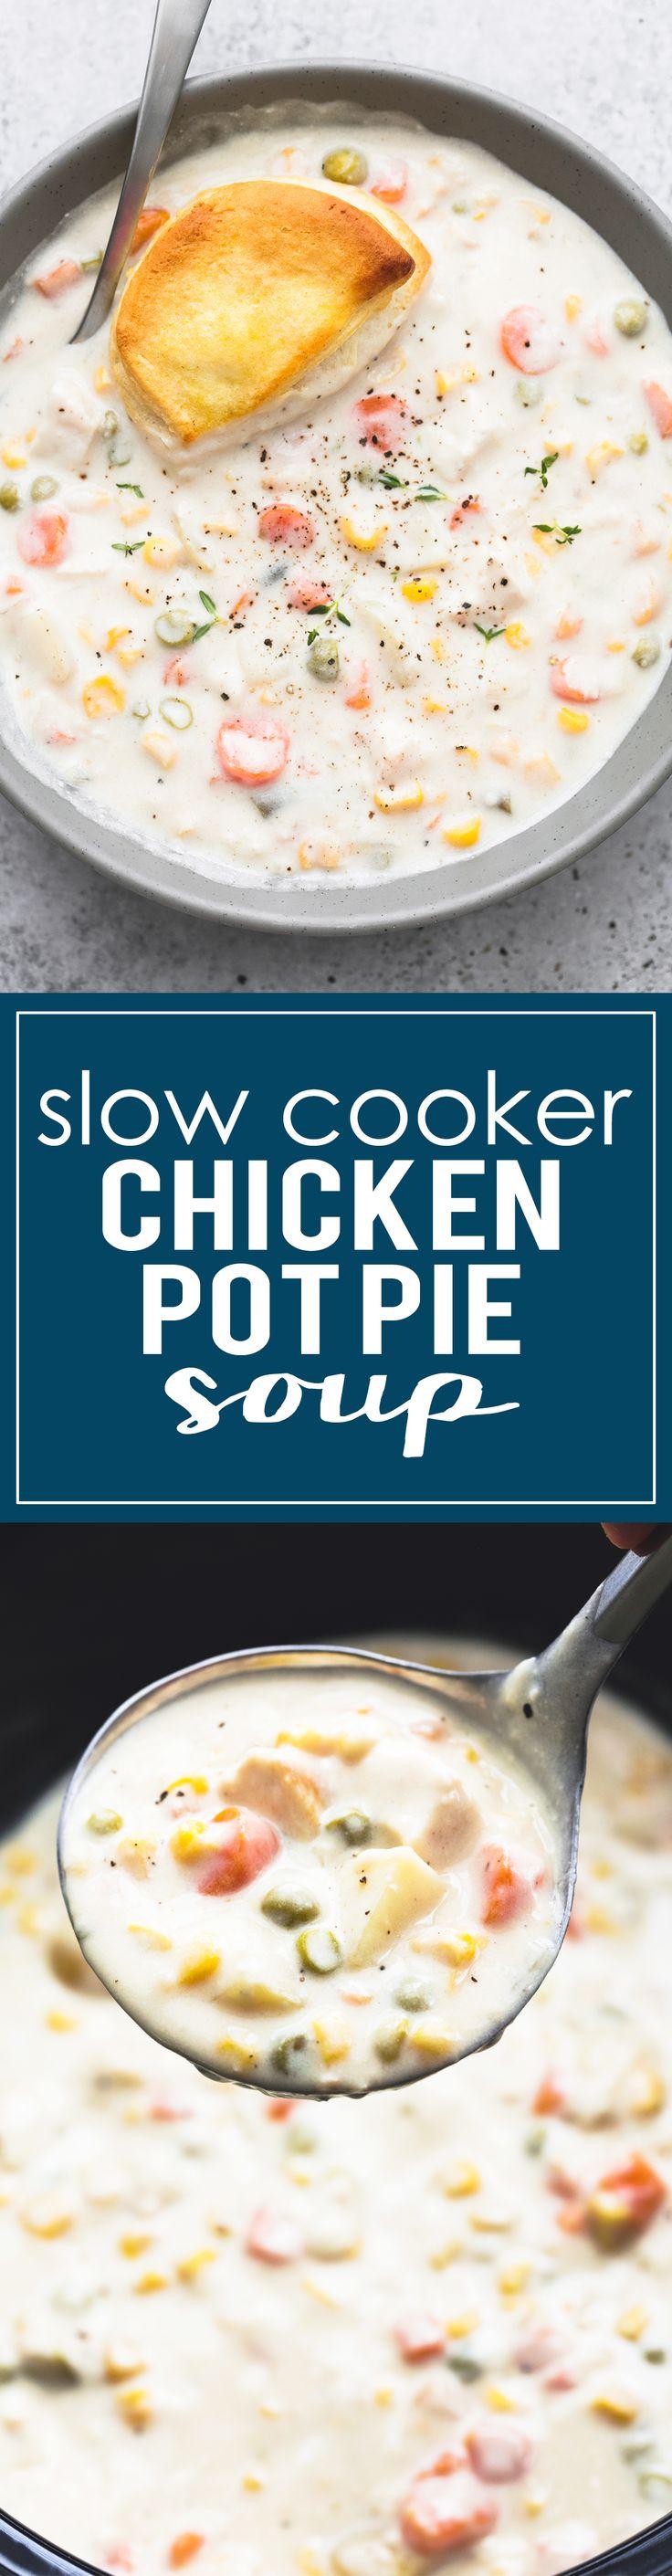 Creamy Slow Cooker Chicken Pot Pie Soup is a delicious twist on classic chicken pot pie. | lecremedelacrumb.com